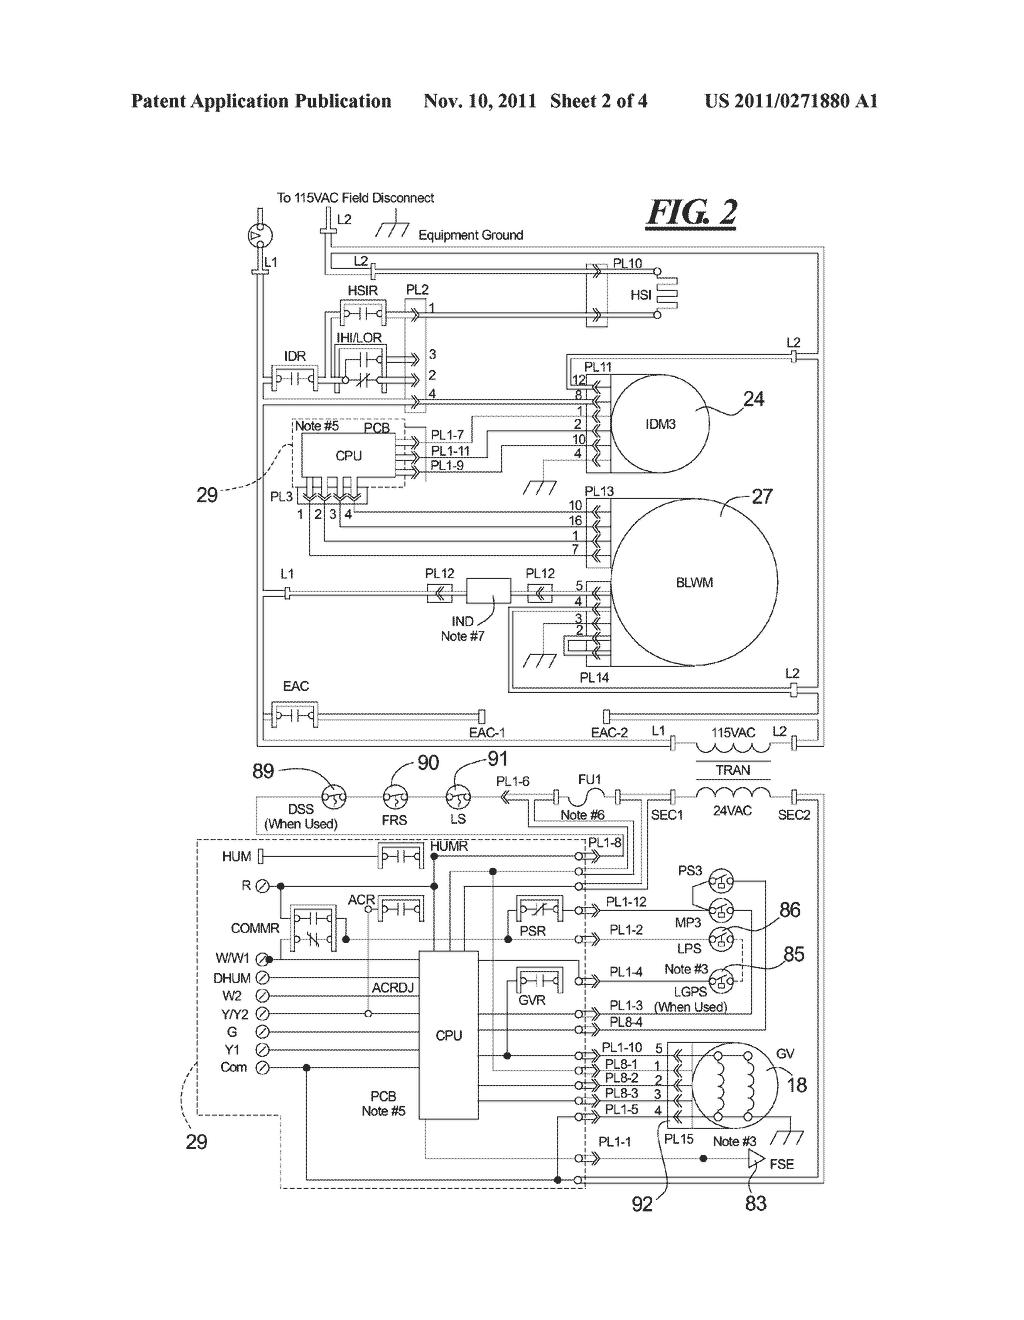 wiring diagram older furnace cn 5836  furnace parts diagrams on mobile home electric furnace  furnace parts diagrams on mobile home